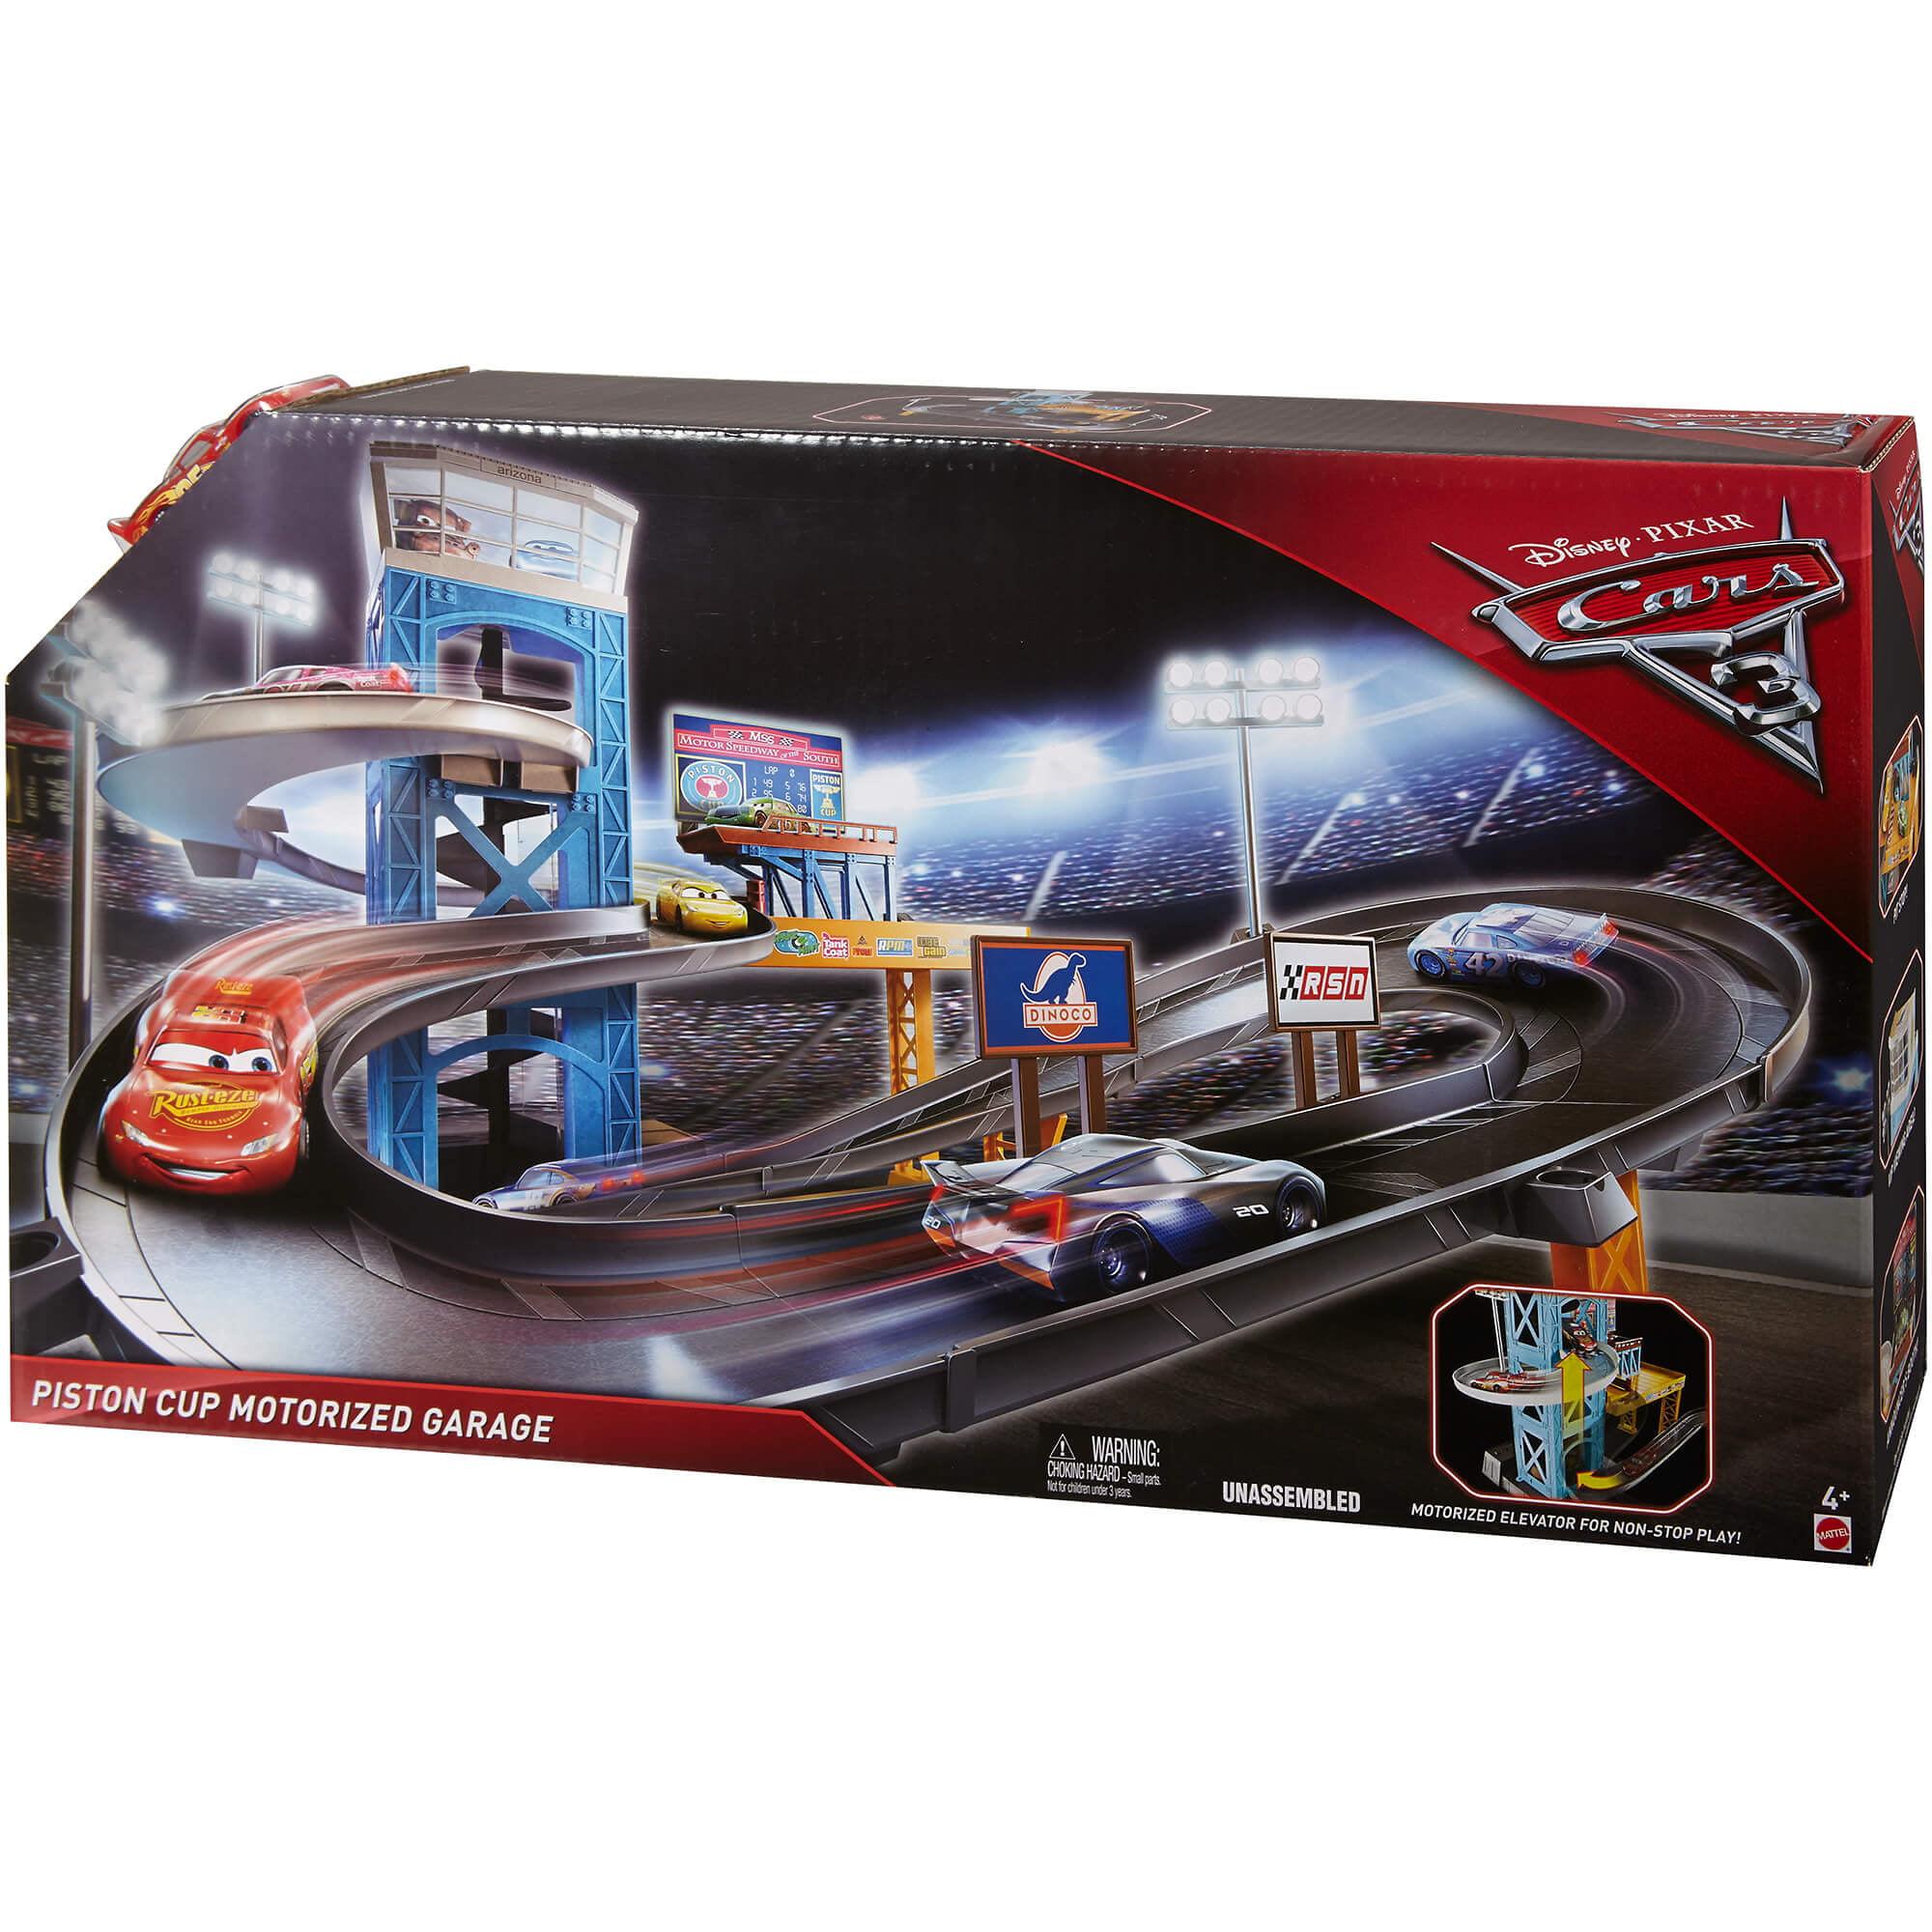 Disney Cars Cars 3 Piston Cup Motorized Garage Playset Walmart